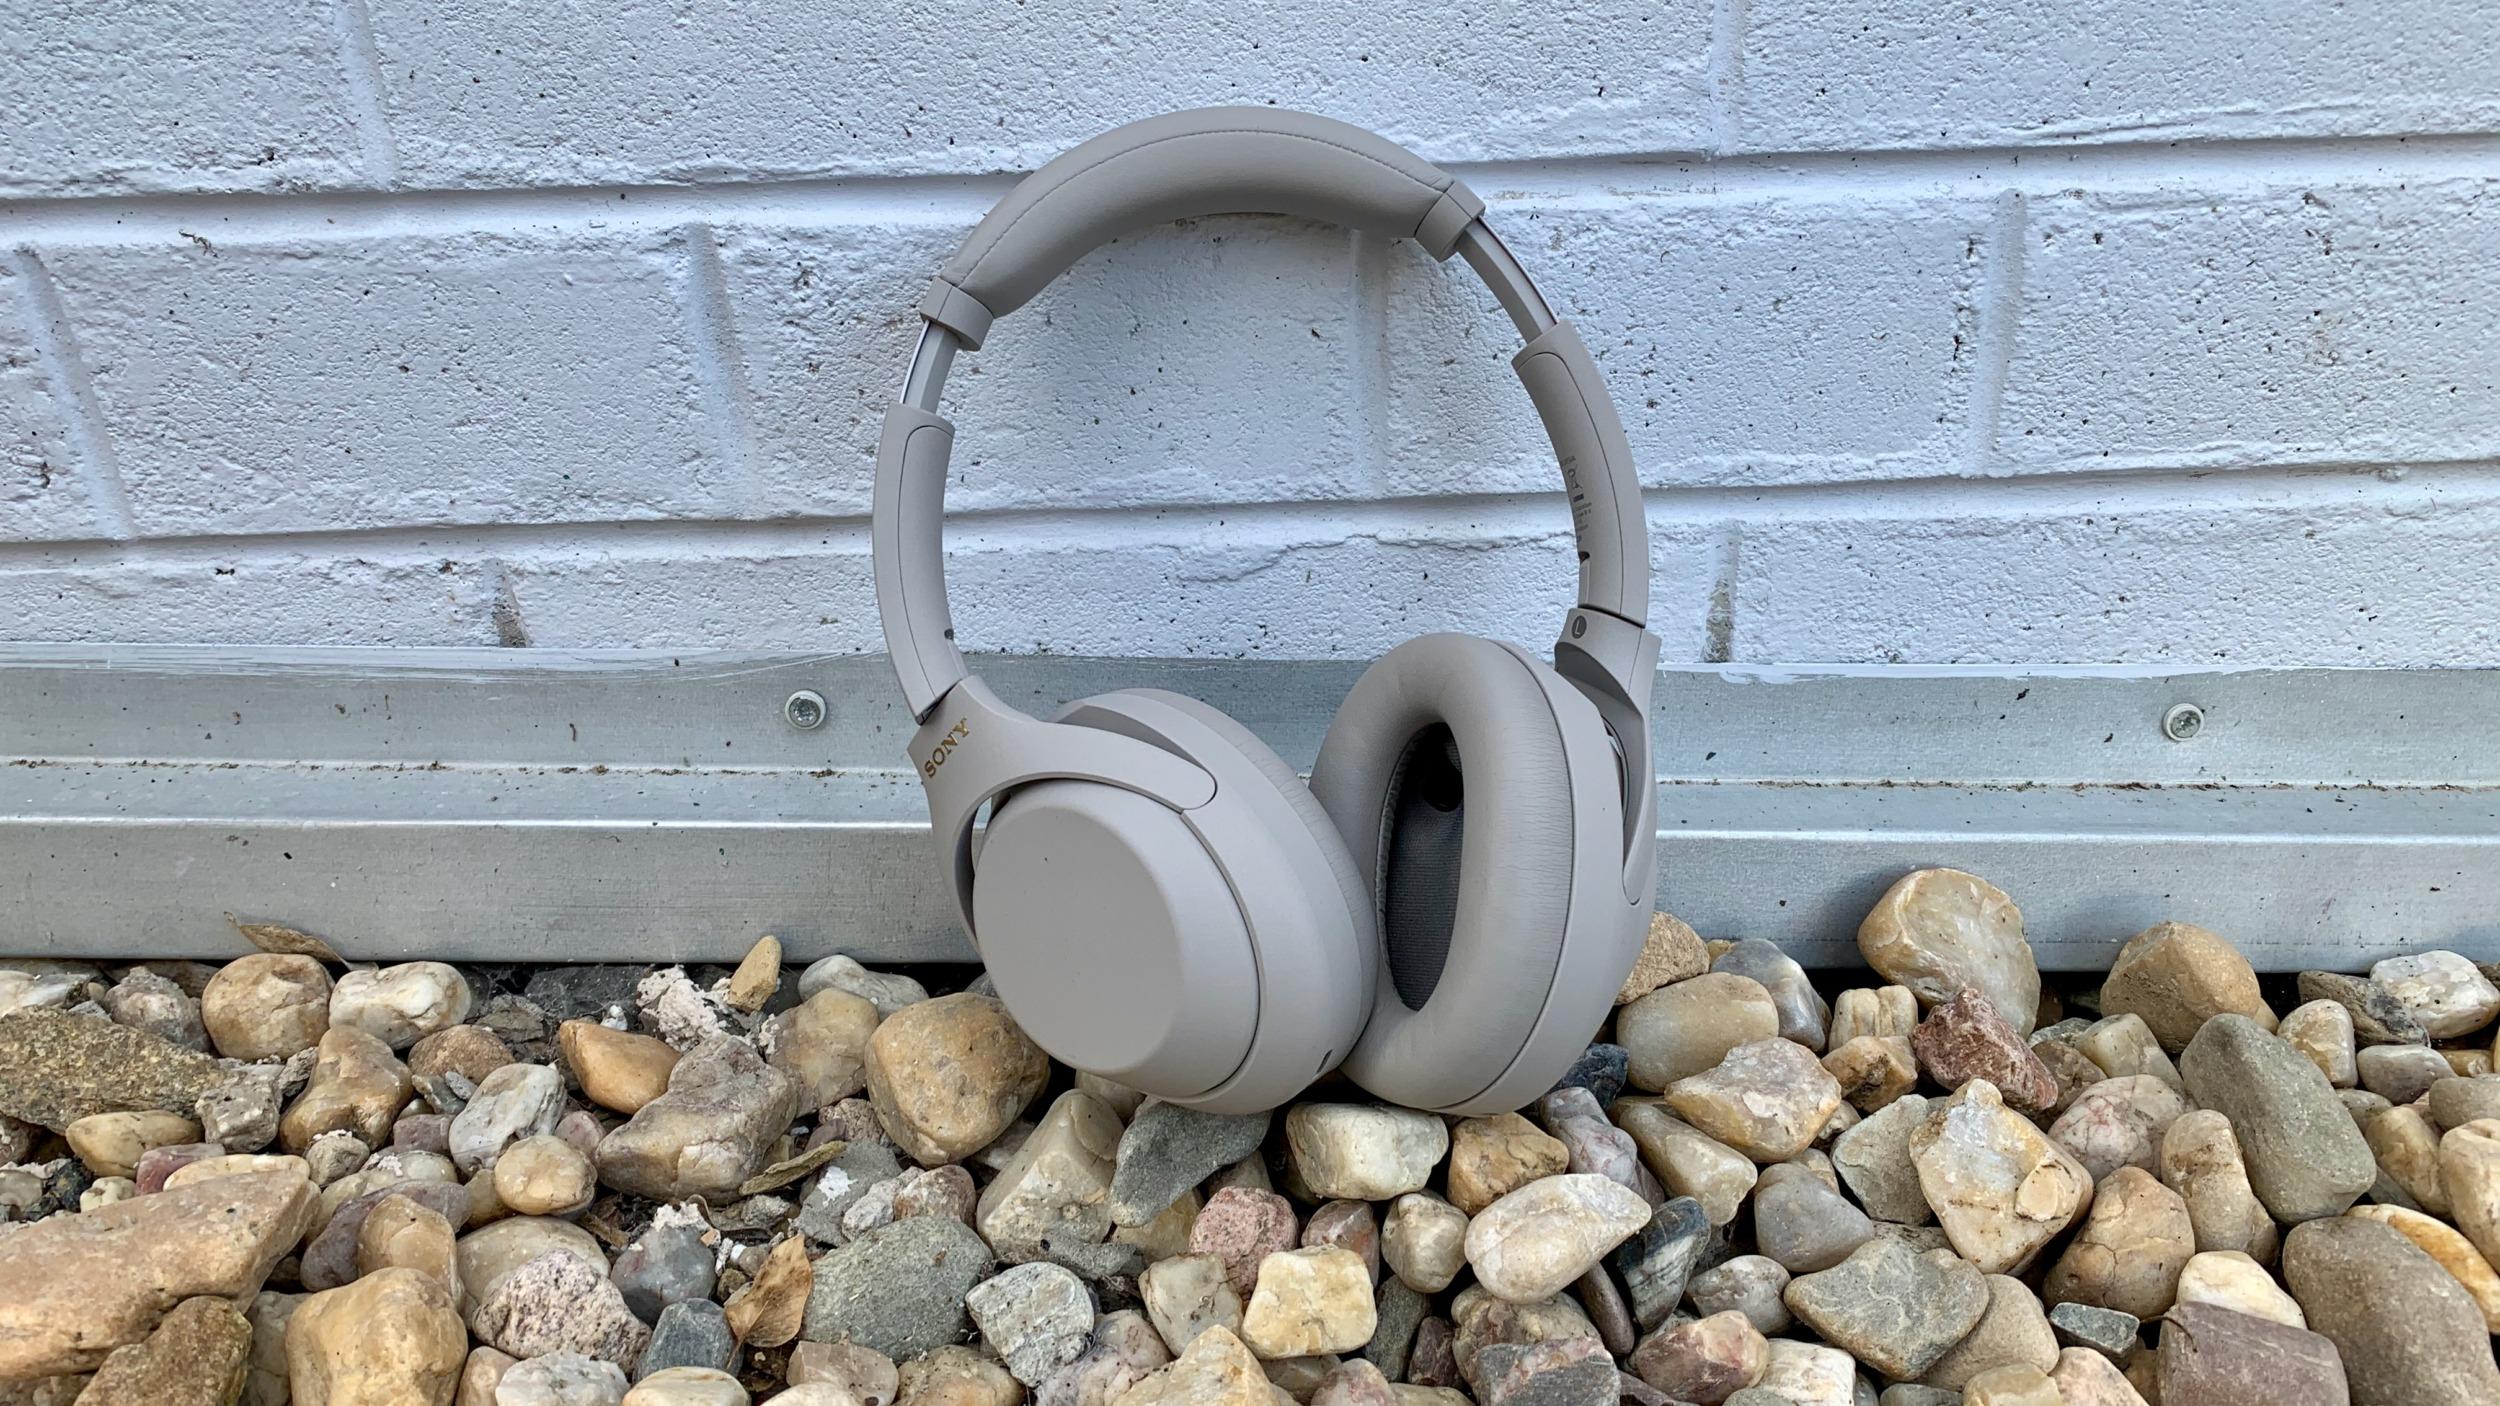 Sony WH-1000XM4 aneb sluchátka pro náročné [recenze]